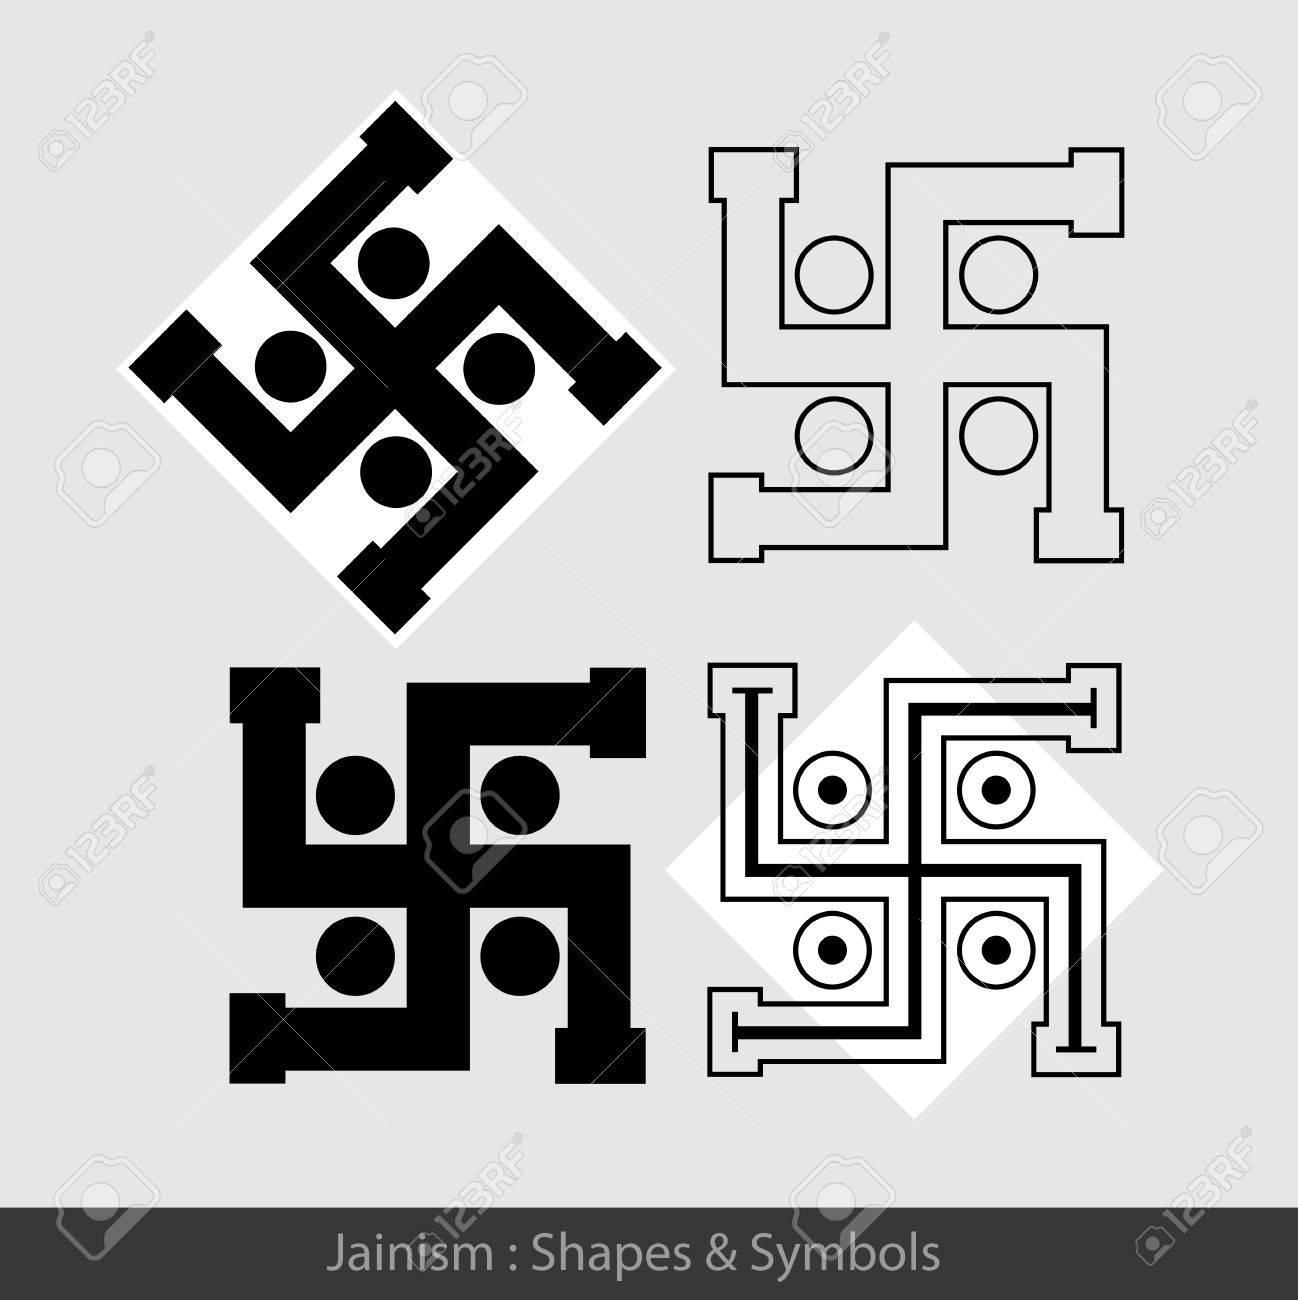 Swastik hindu symbols royalty free cliparts vectors and stock swastik hindu symbols stock vector 57728893 biocorpaavc